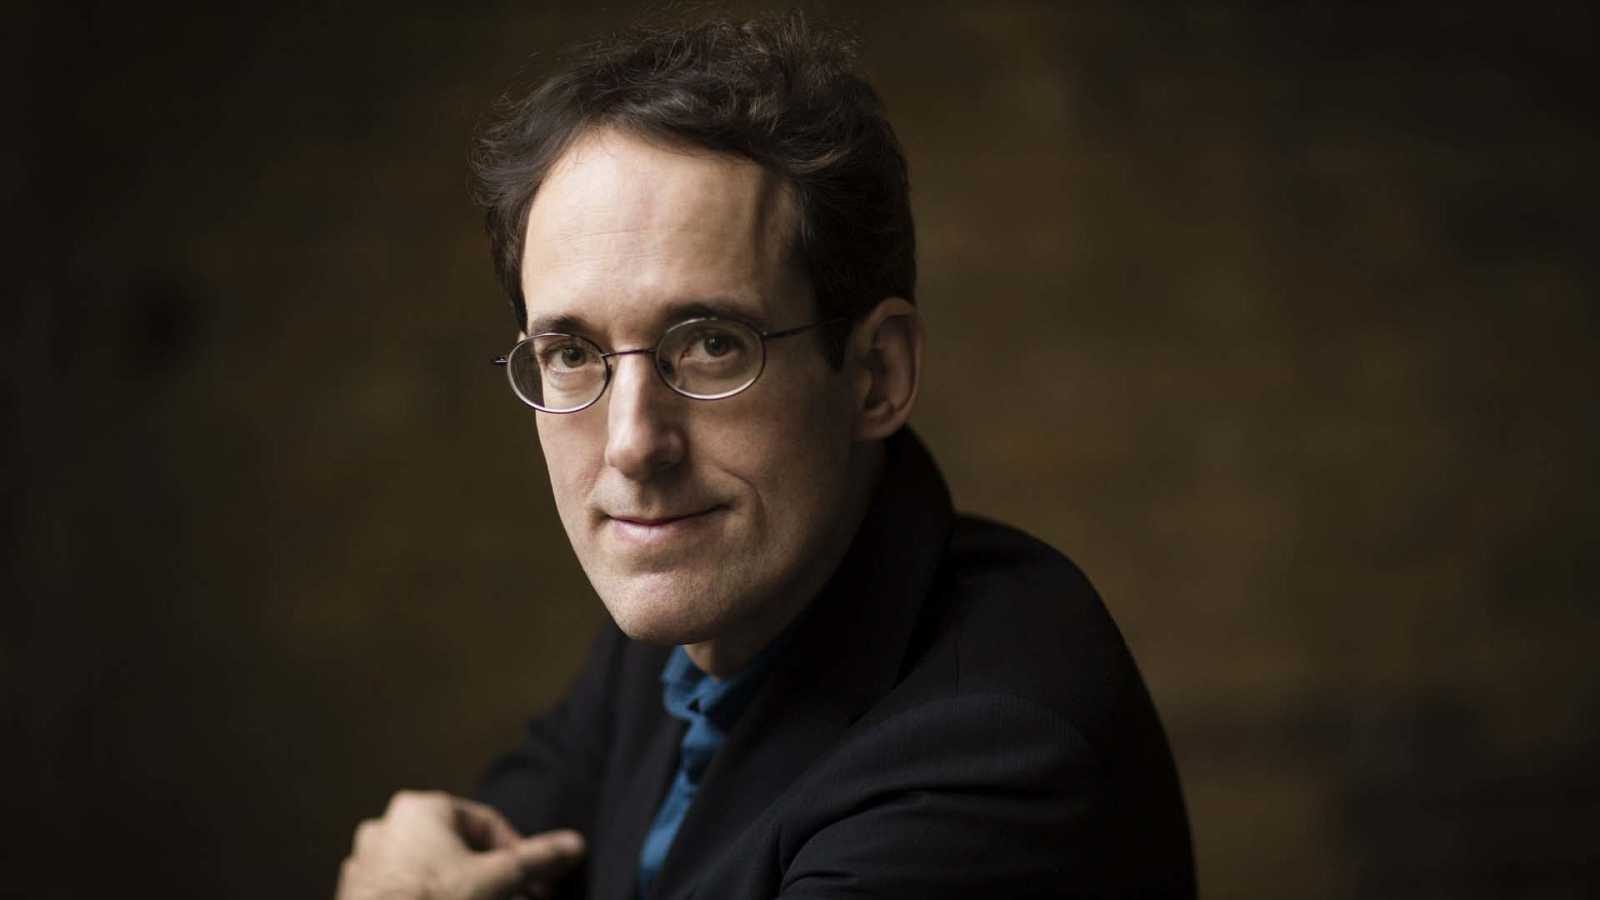 Pablo González, director titular de la Orquesta Sinfónica RTVE